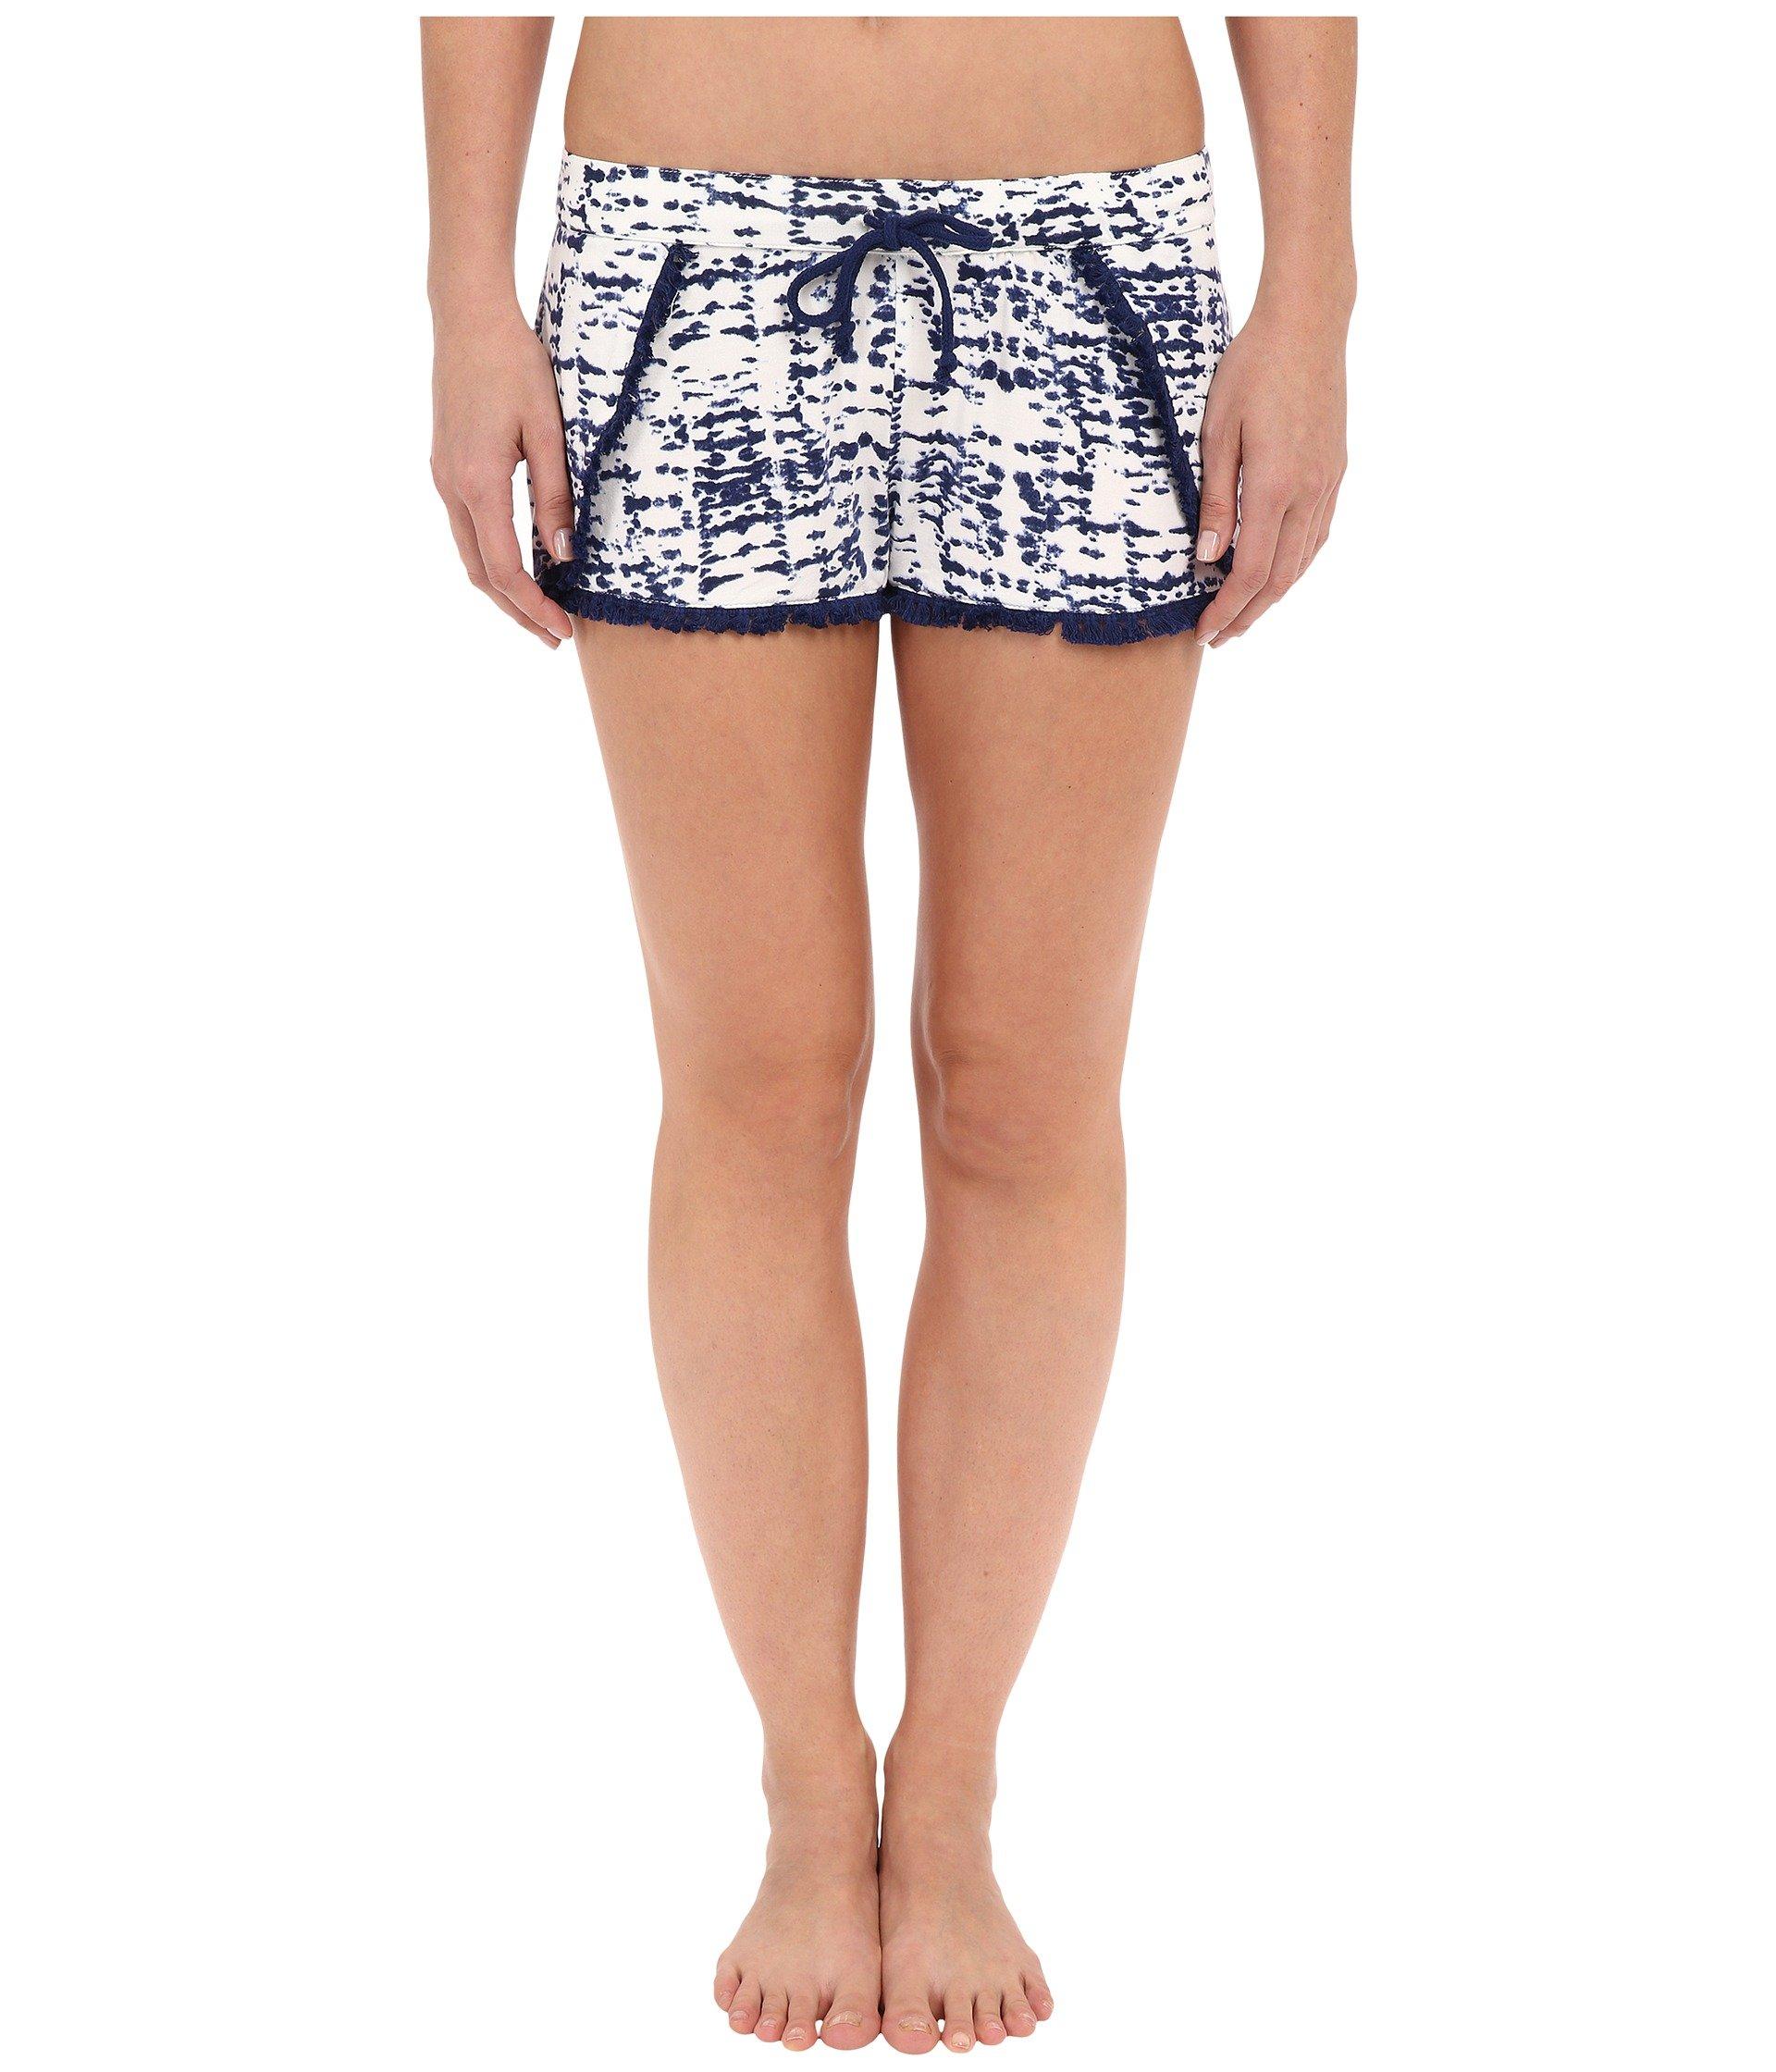 Pantalón de Pijama para Mujer P.J. Salvage Tie-Dye Lace-Trim Short  + P.J. Salvage en VeoyCompro.net